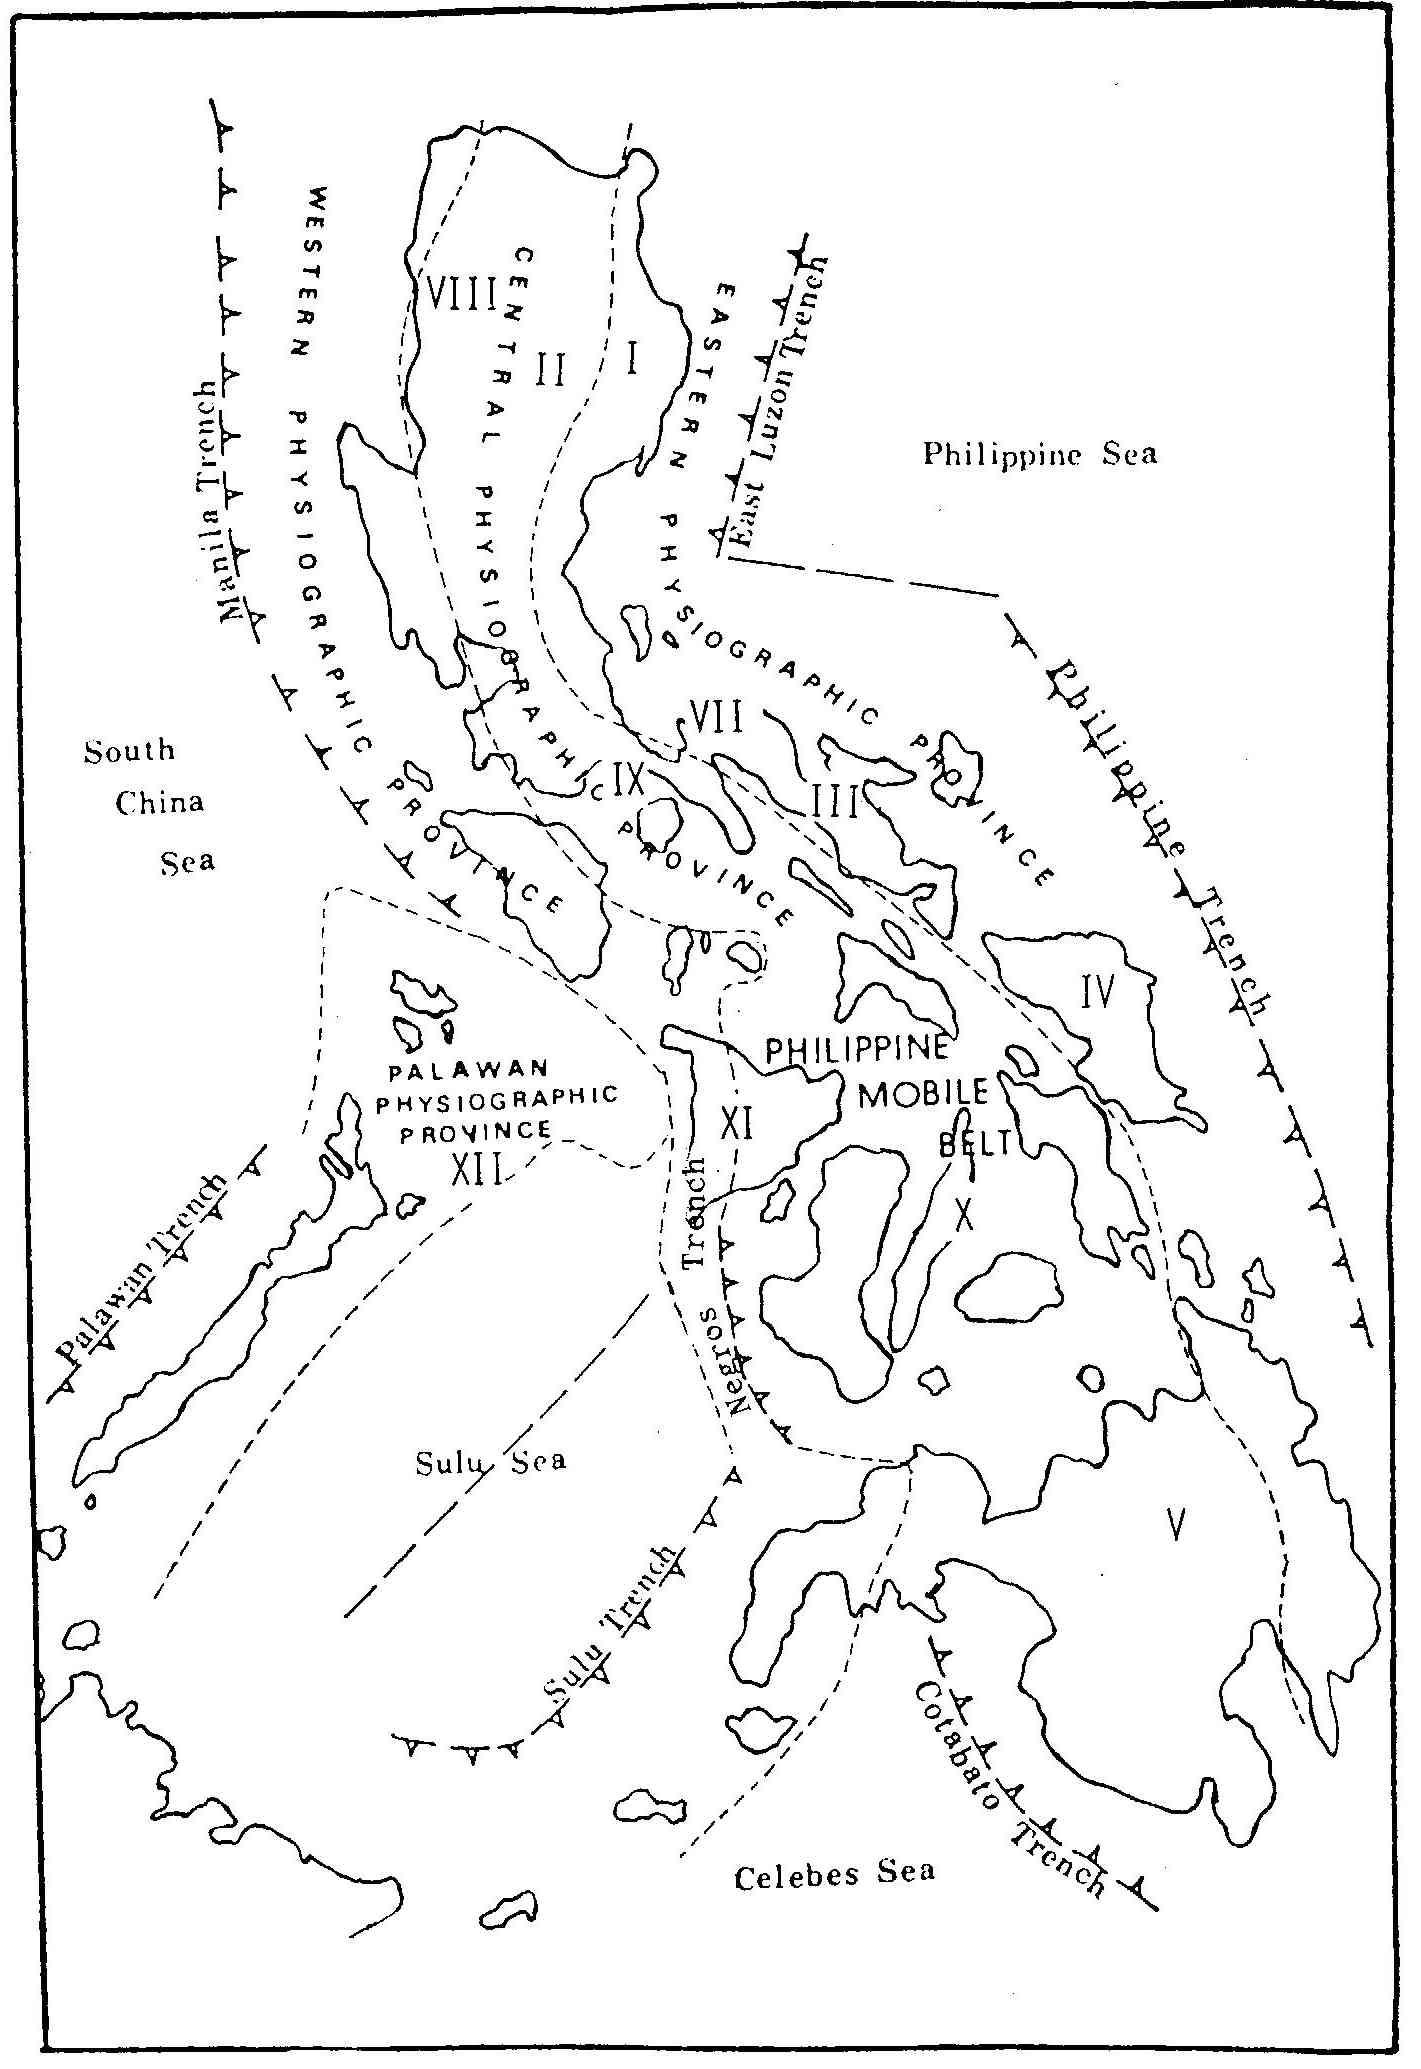 Philippine Mobile Belt